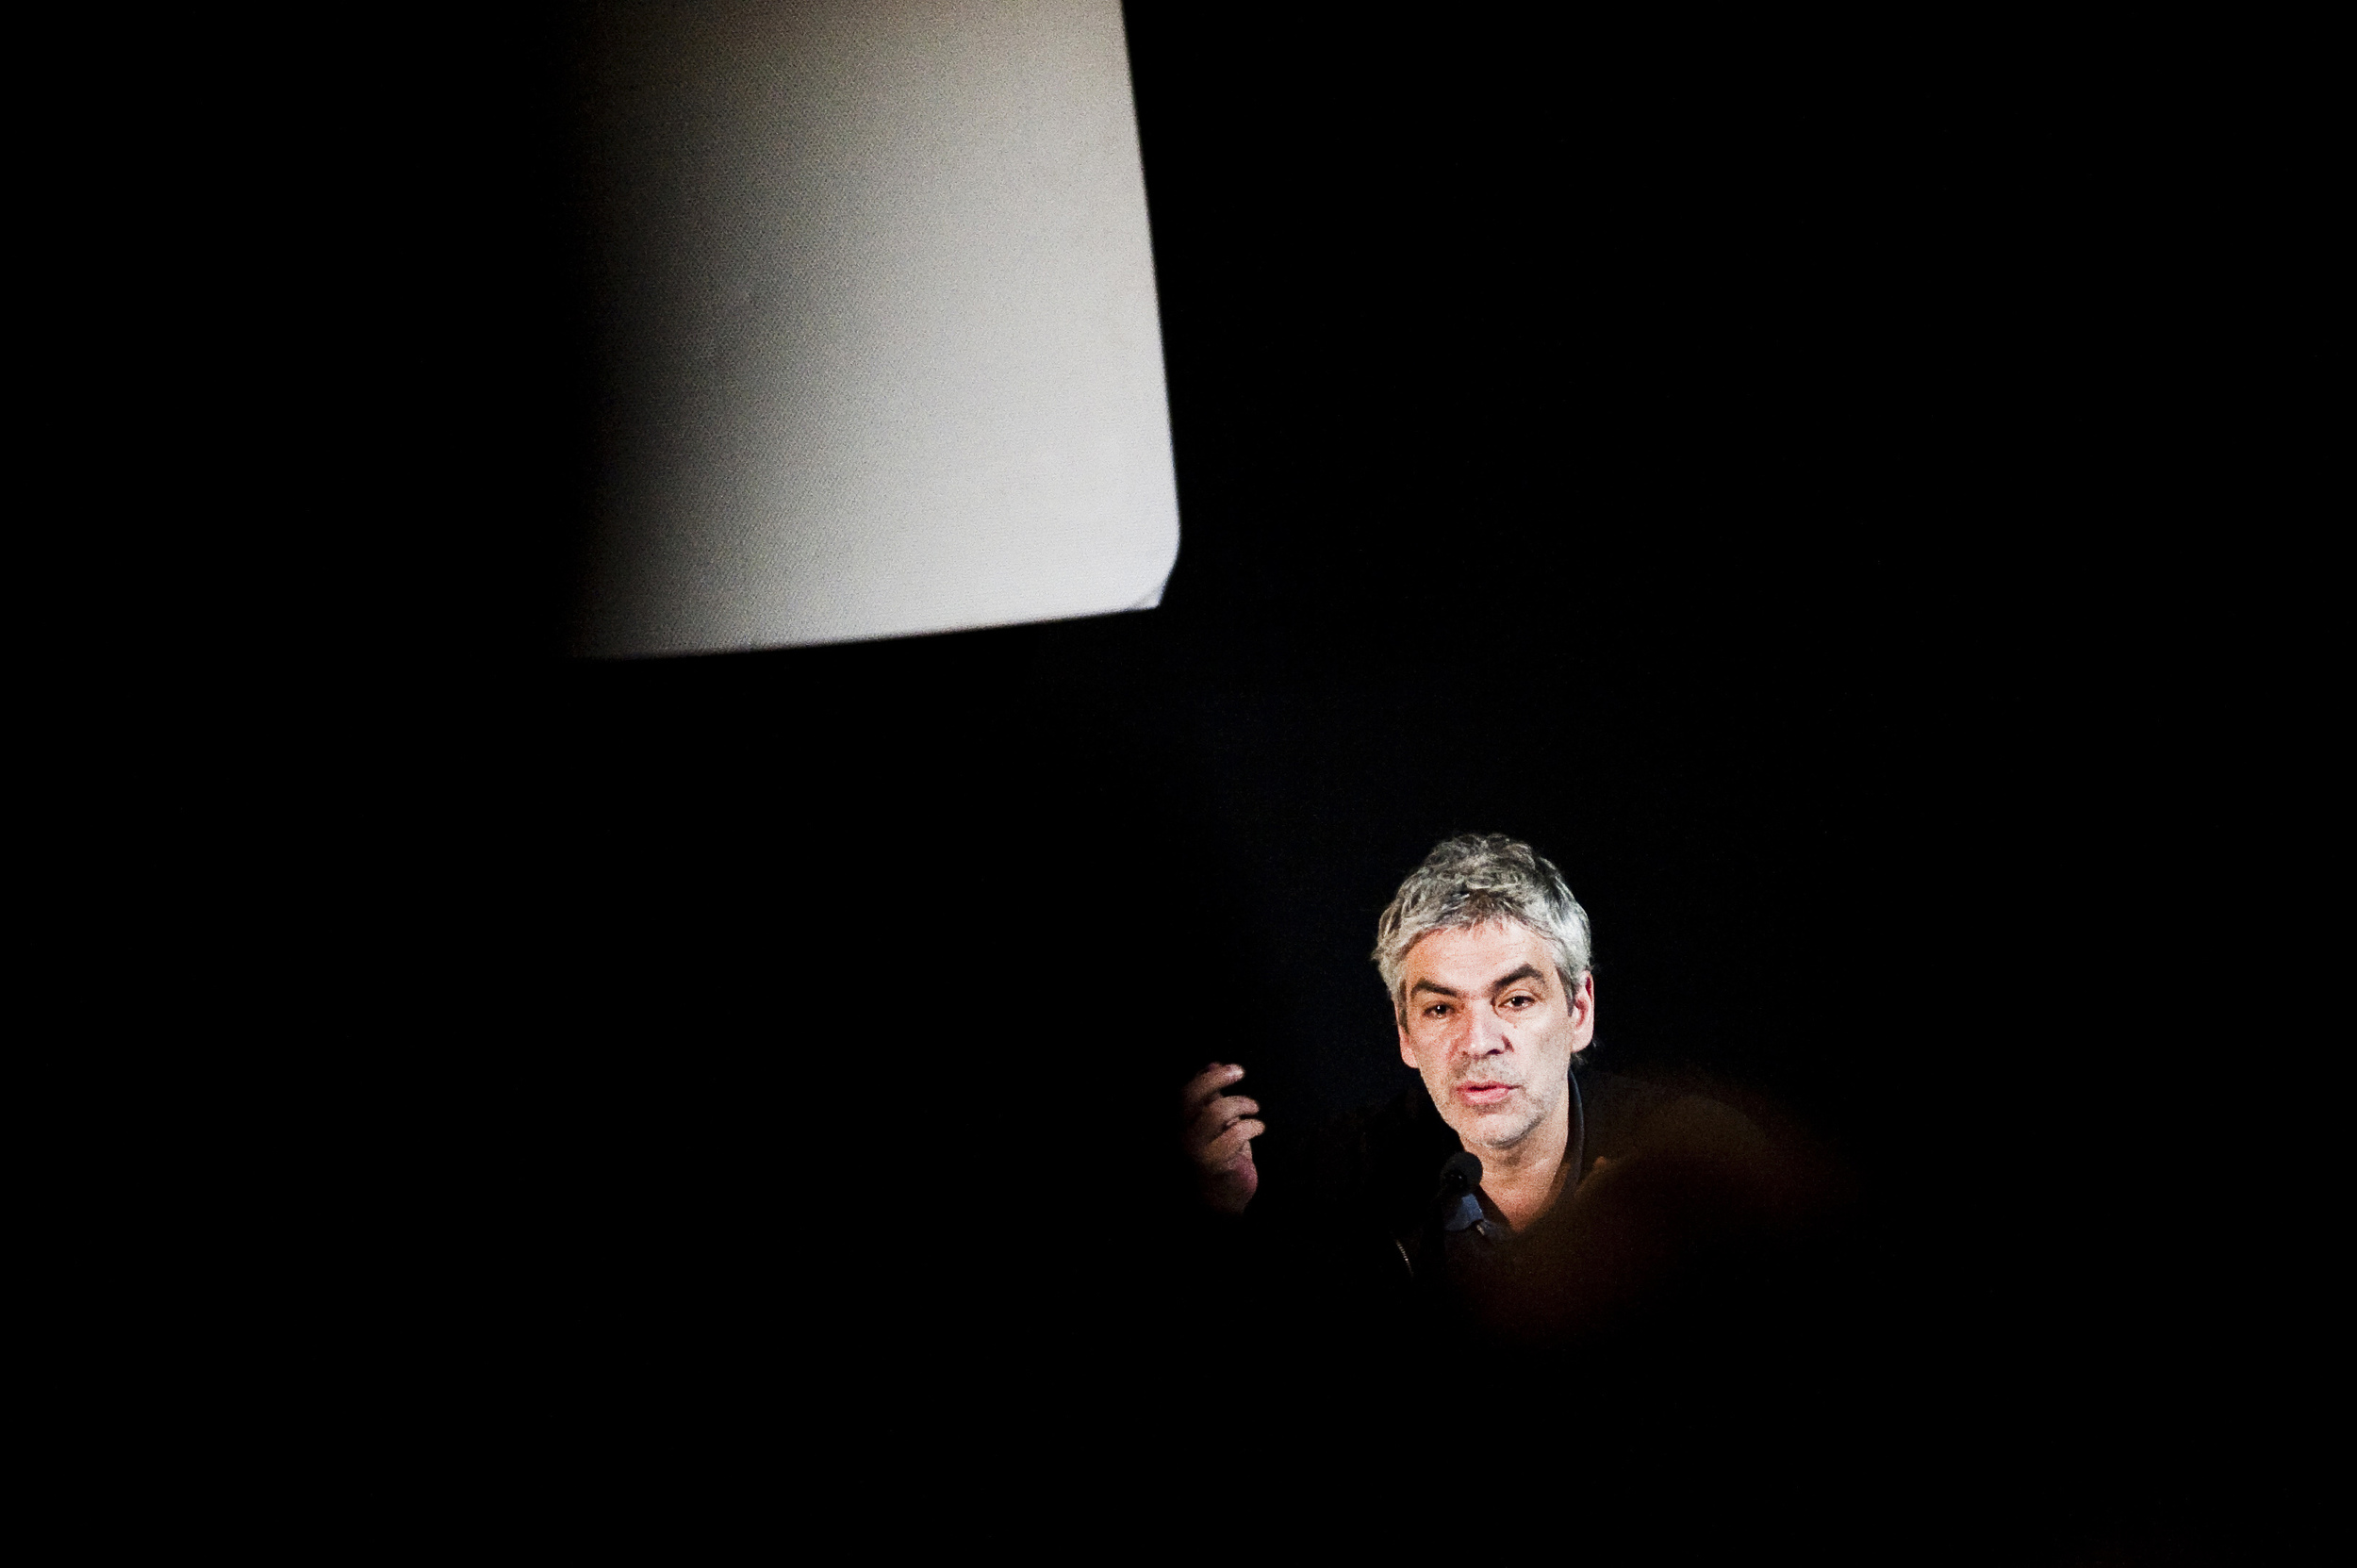 Pedro Costa in a photo taken by Jussi Leinonen